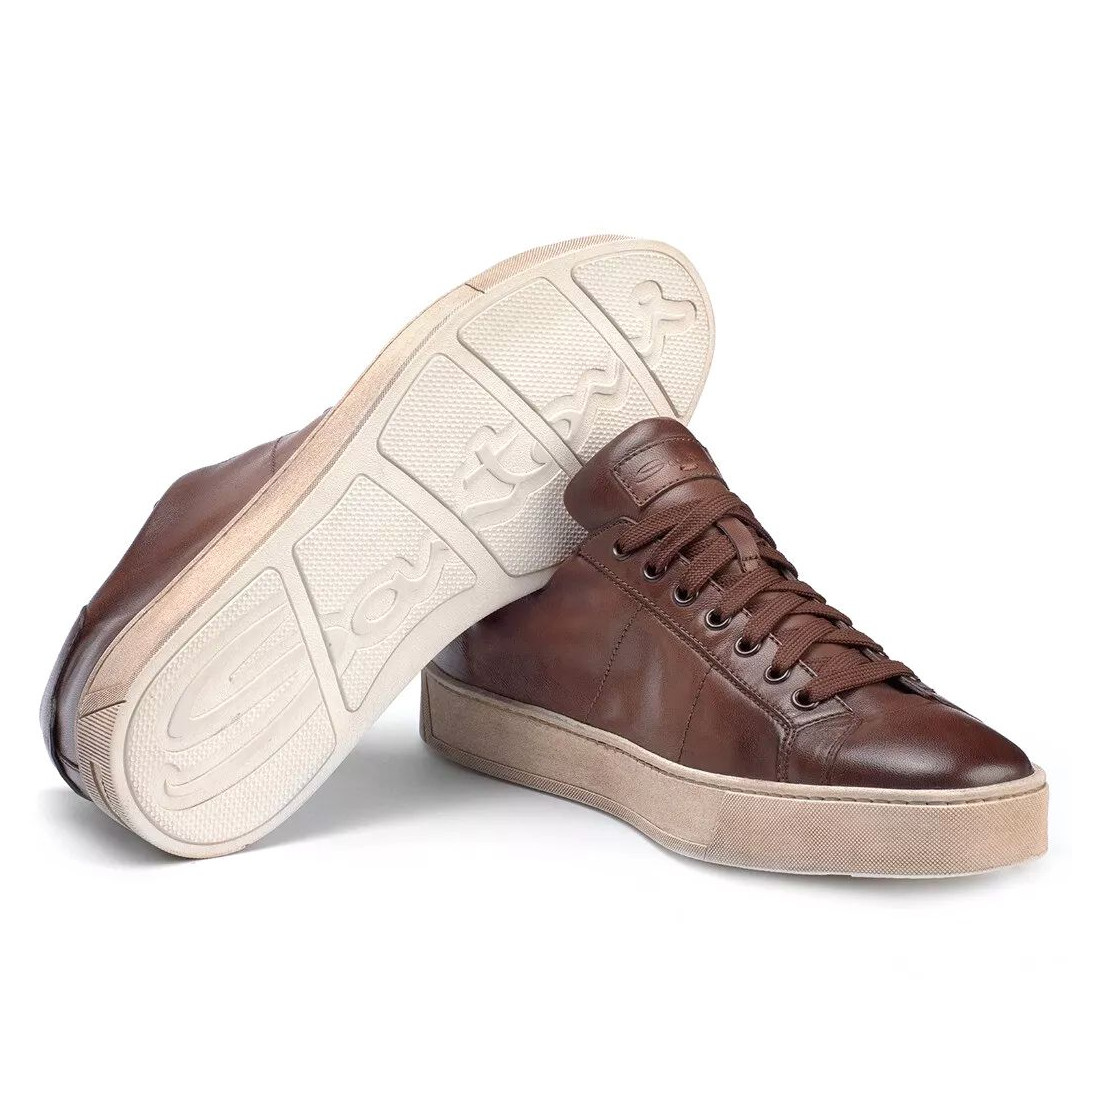 sneakers man santoni mbgl20850spomgoos50 7304